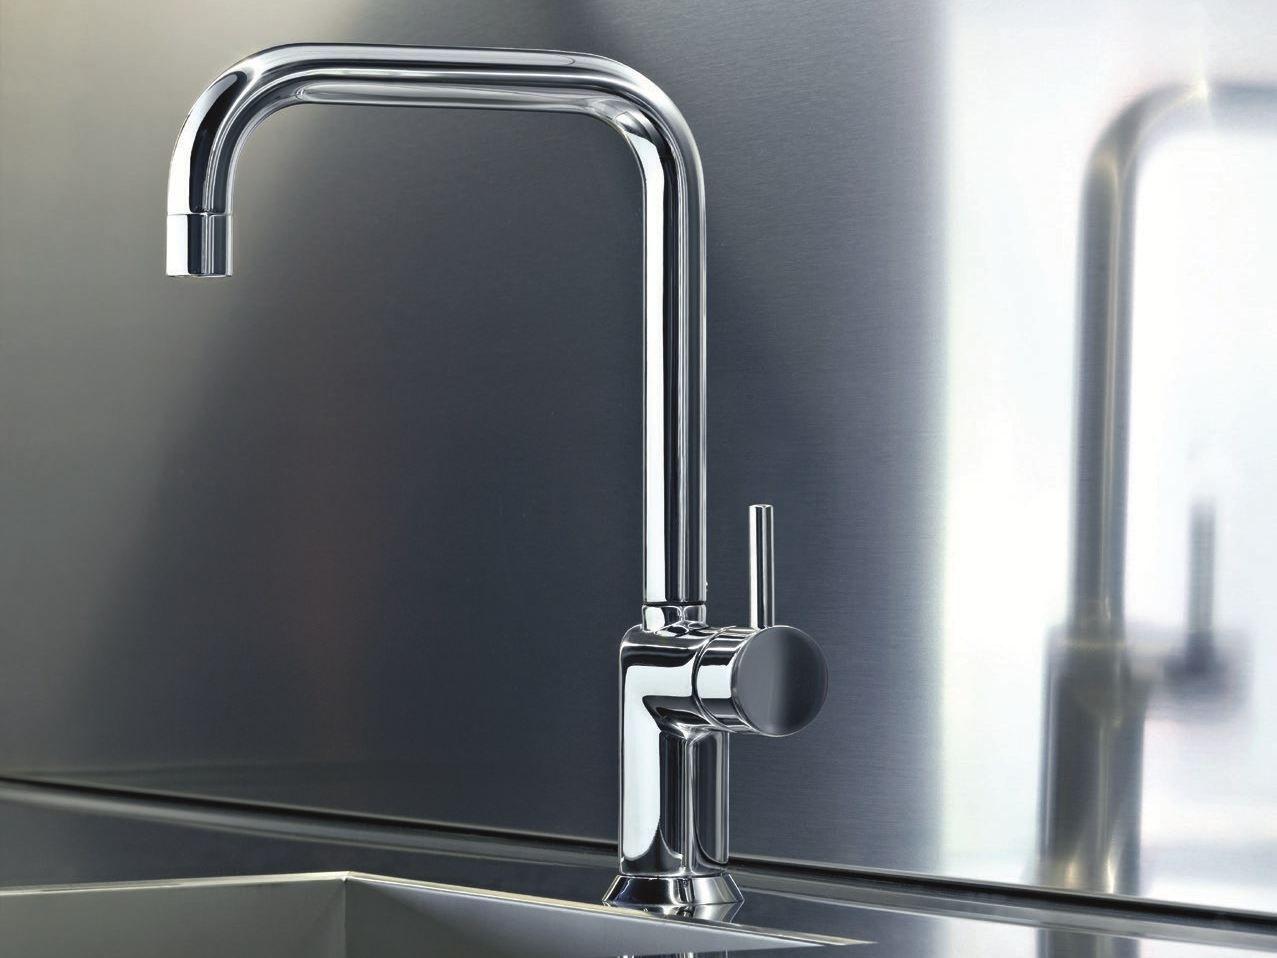 Caf miscelatore da cucina da piano by fantini rubinetti design davide mercatali - Rubinetti x cucina ...